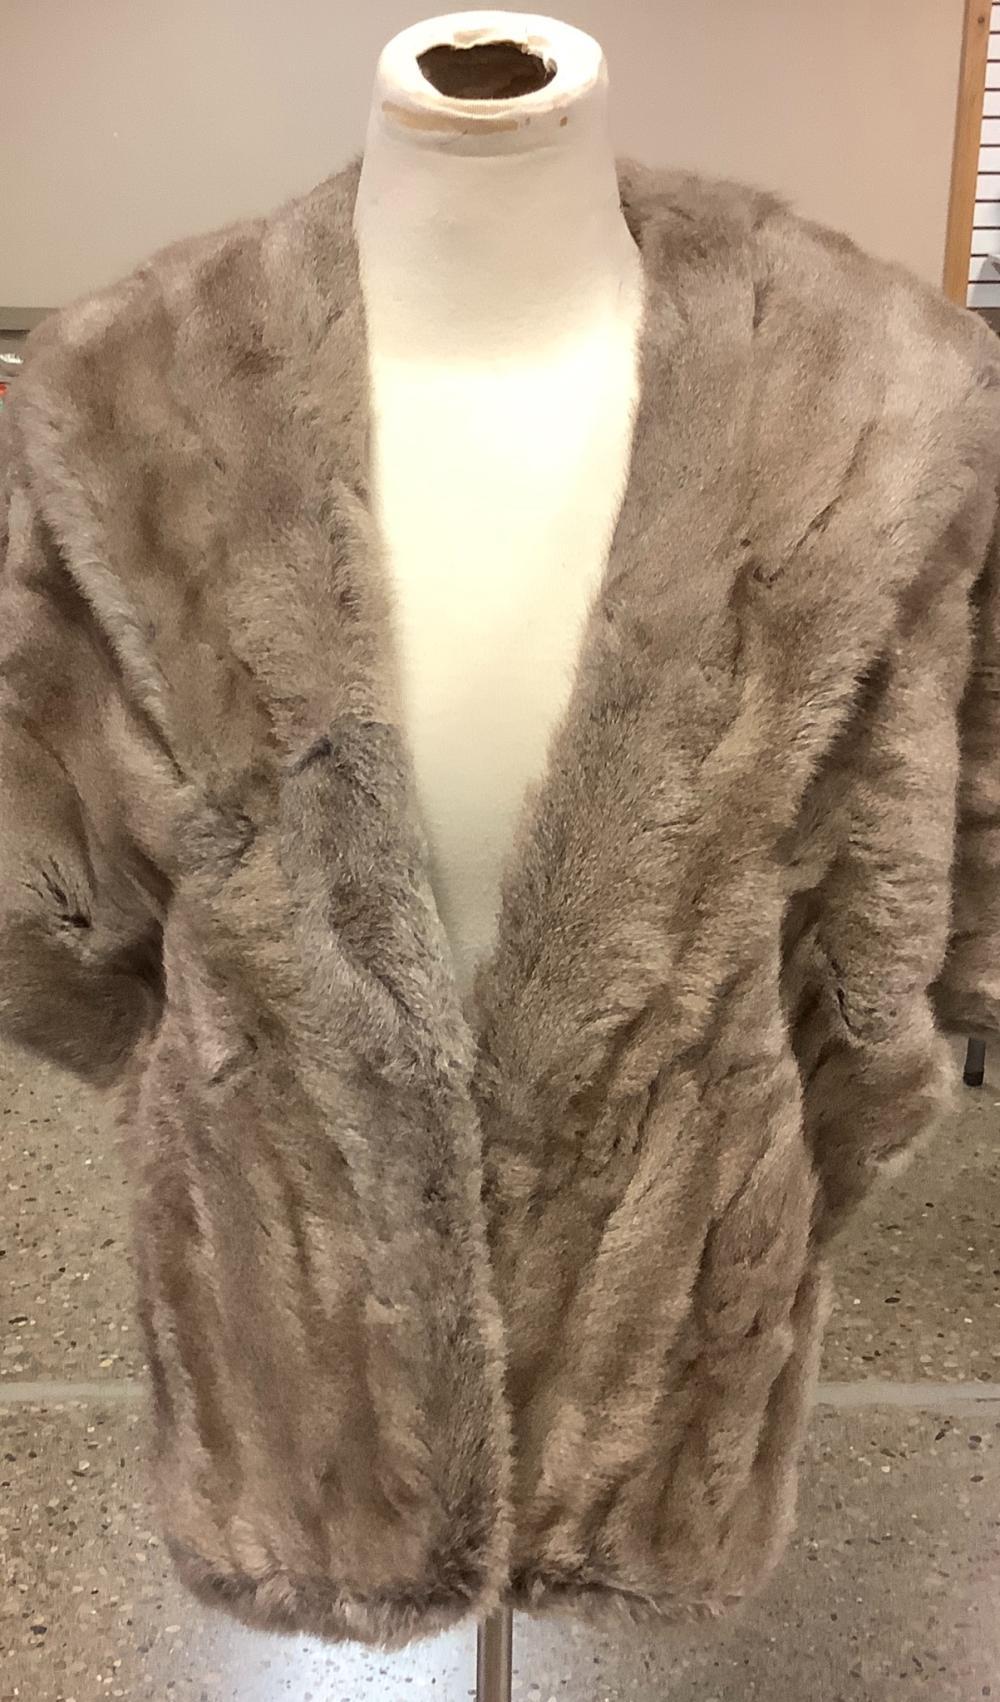 Gray mink stole looks like a small.